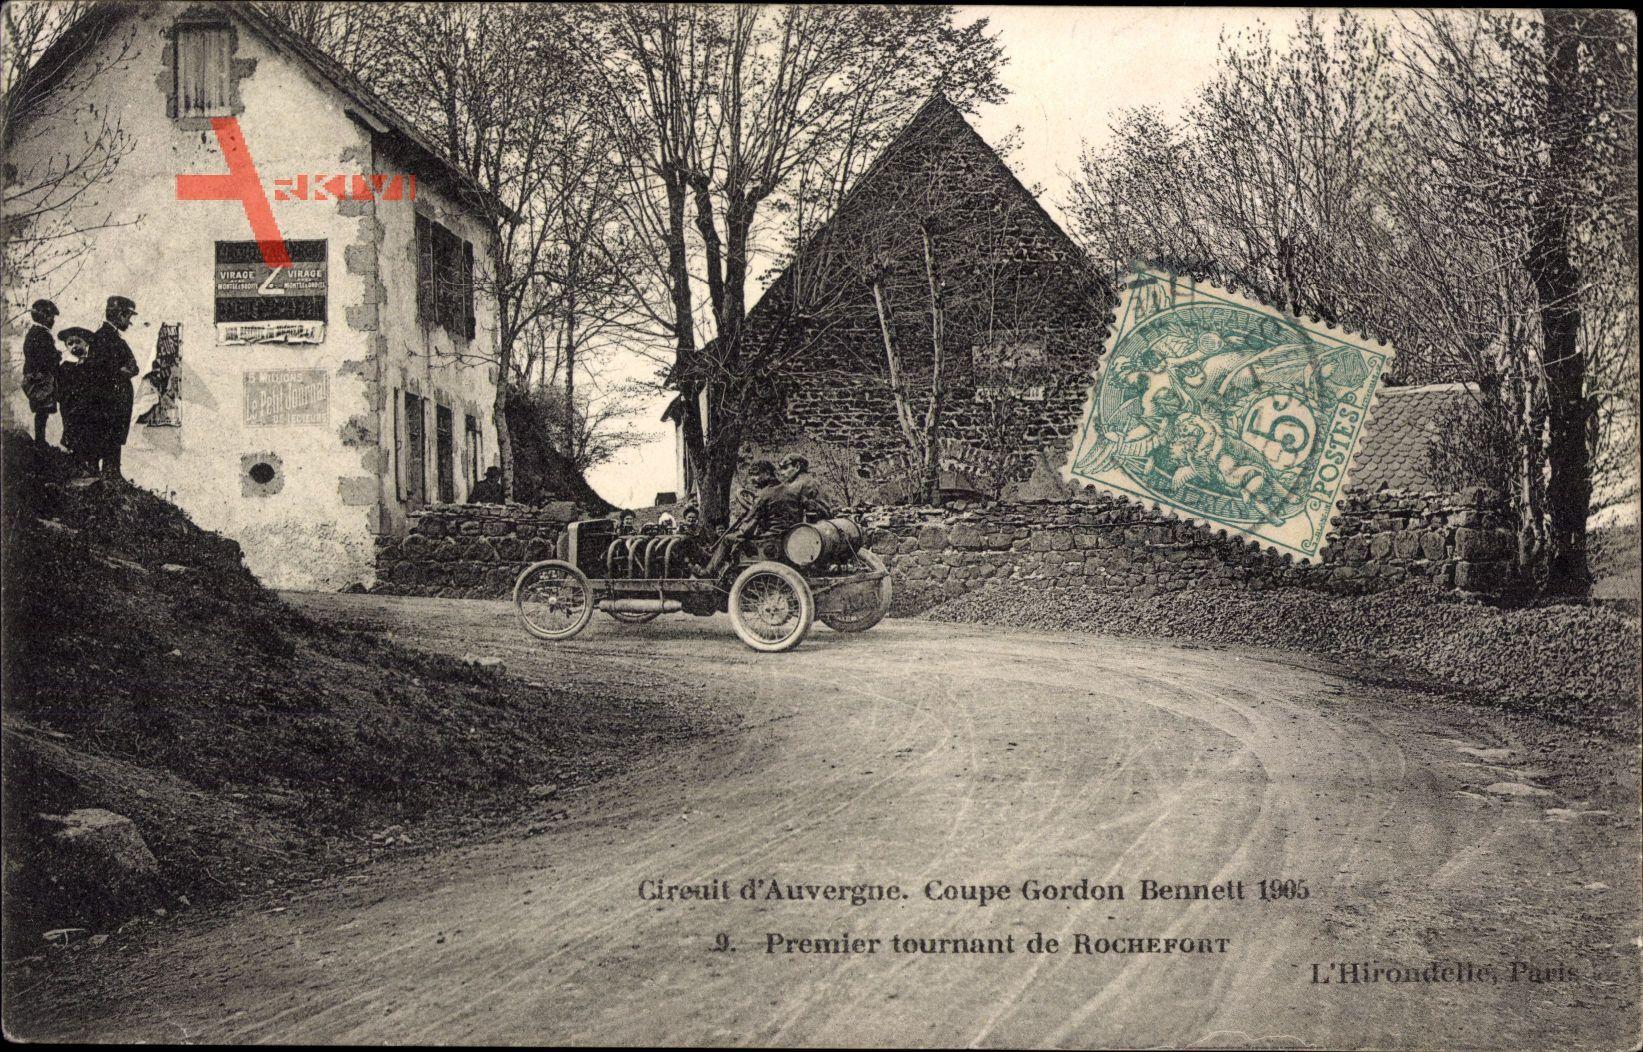 Circuit dAuvergne, Coupe Gordon Bennett 1905, Tournant de Rochefort